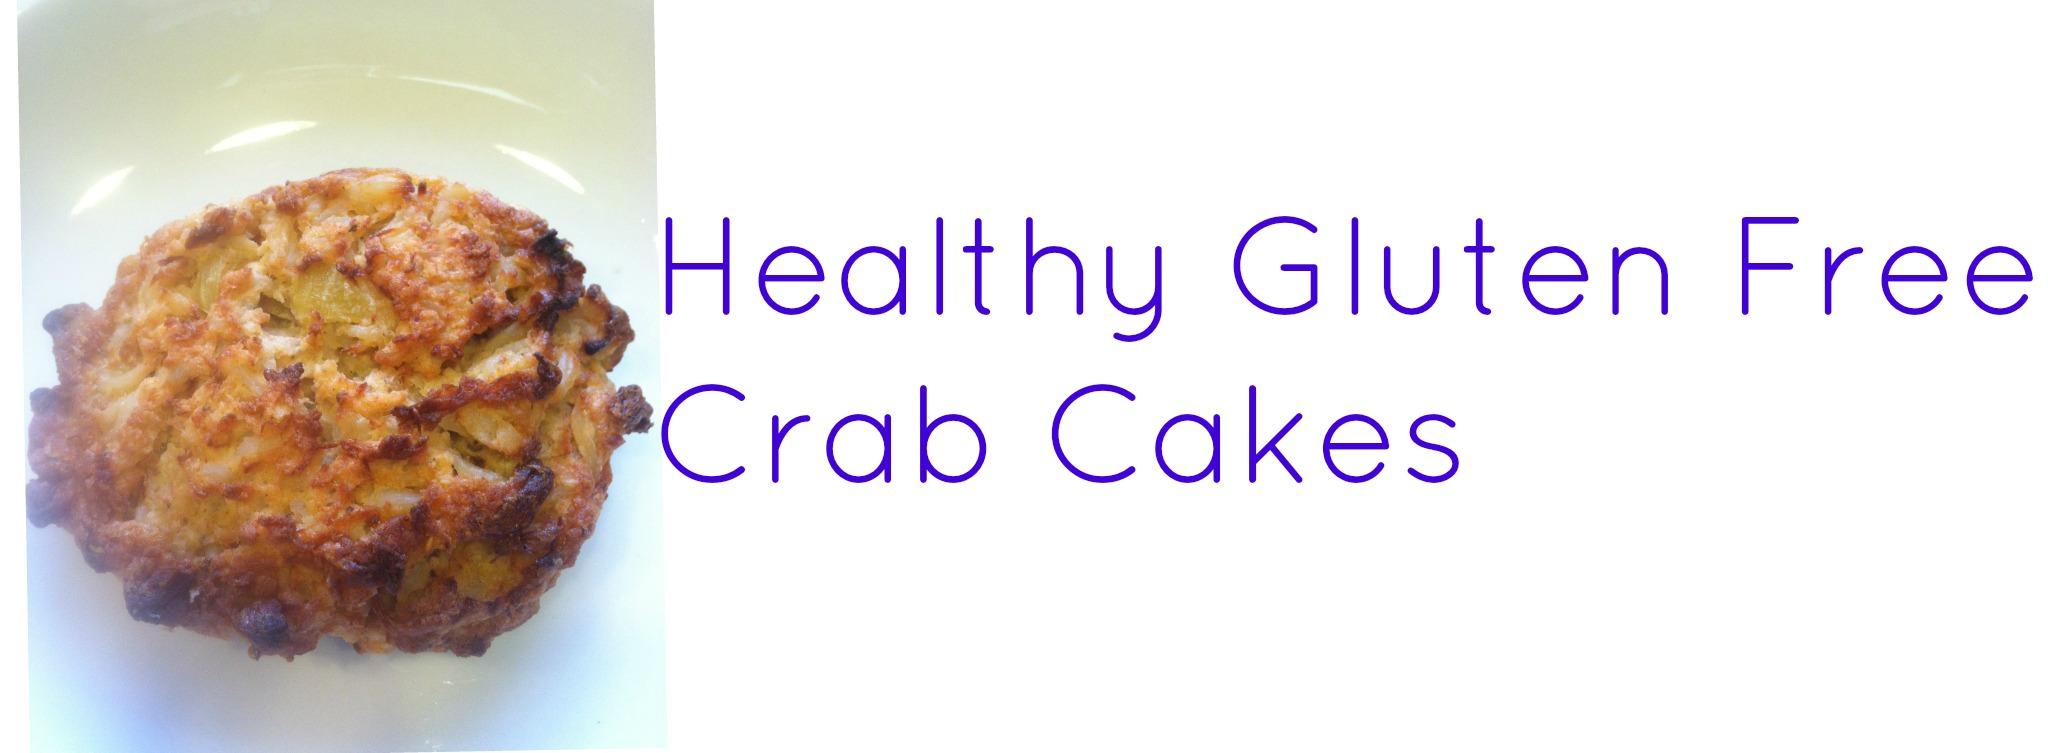 Recipe: Healthy Gluten Free Crab Cakes | Eat Like An Elephant